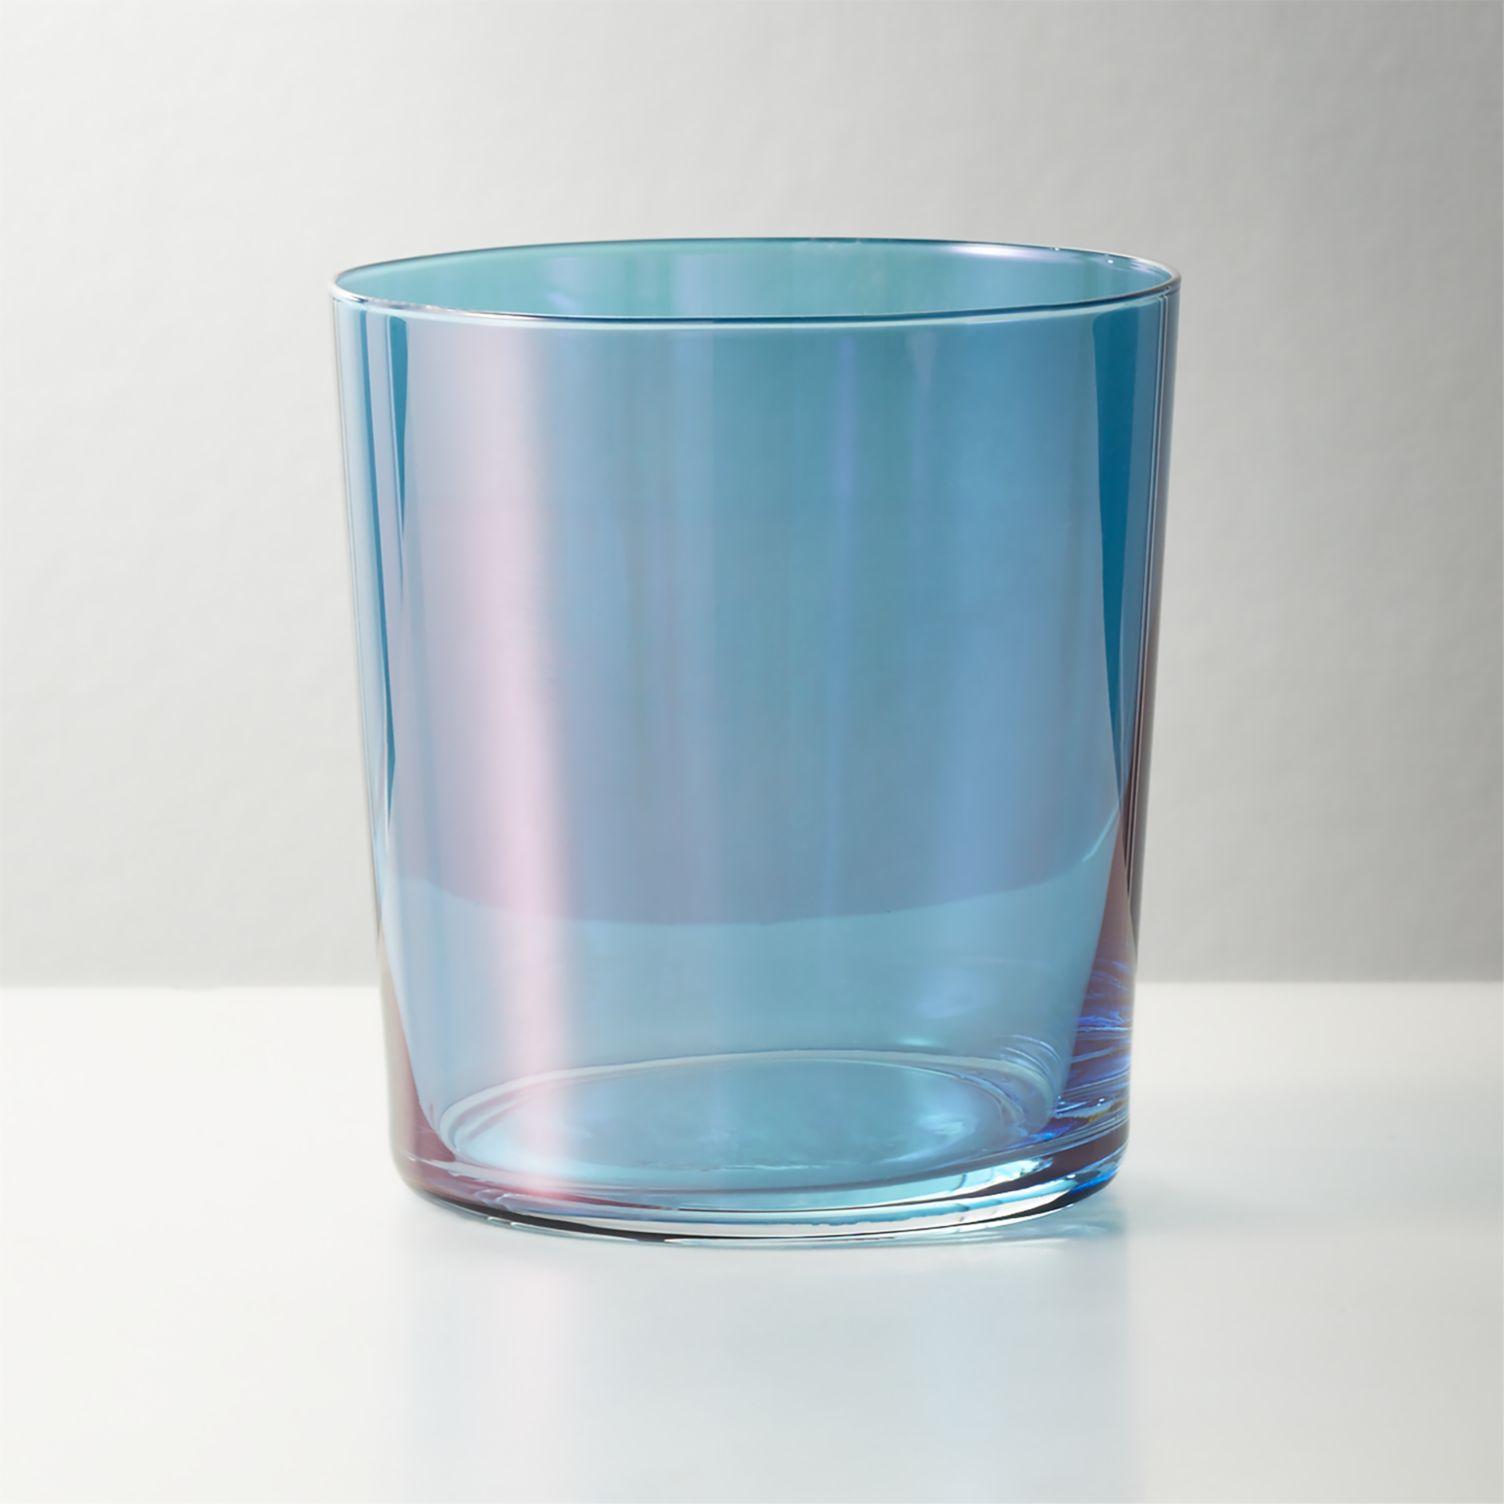 Teal luster glassware